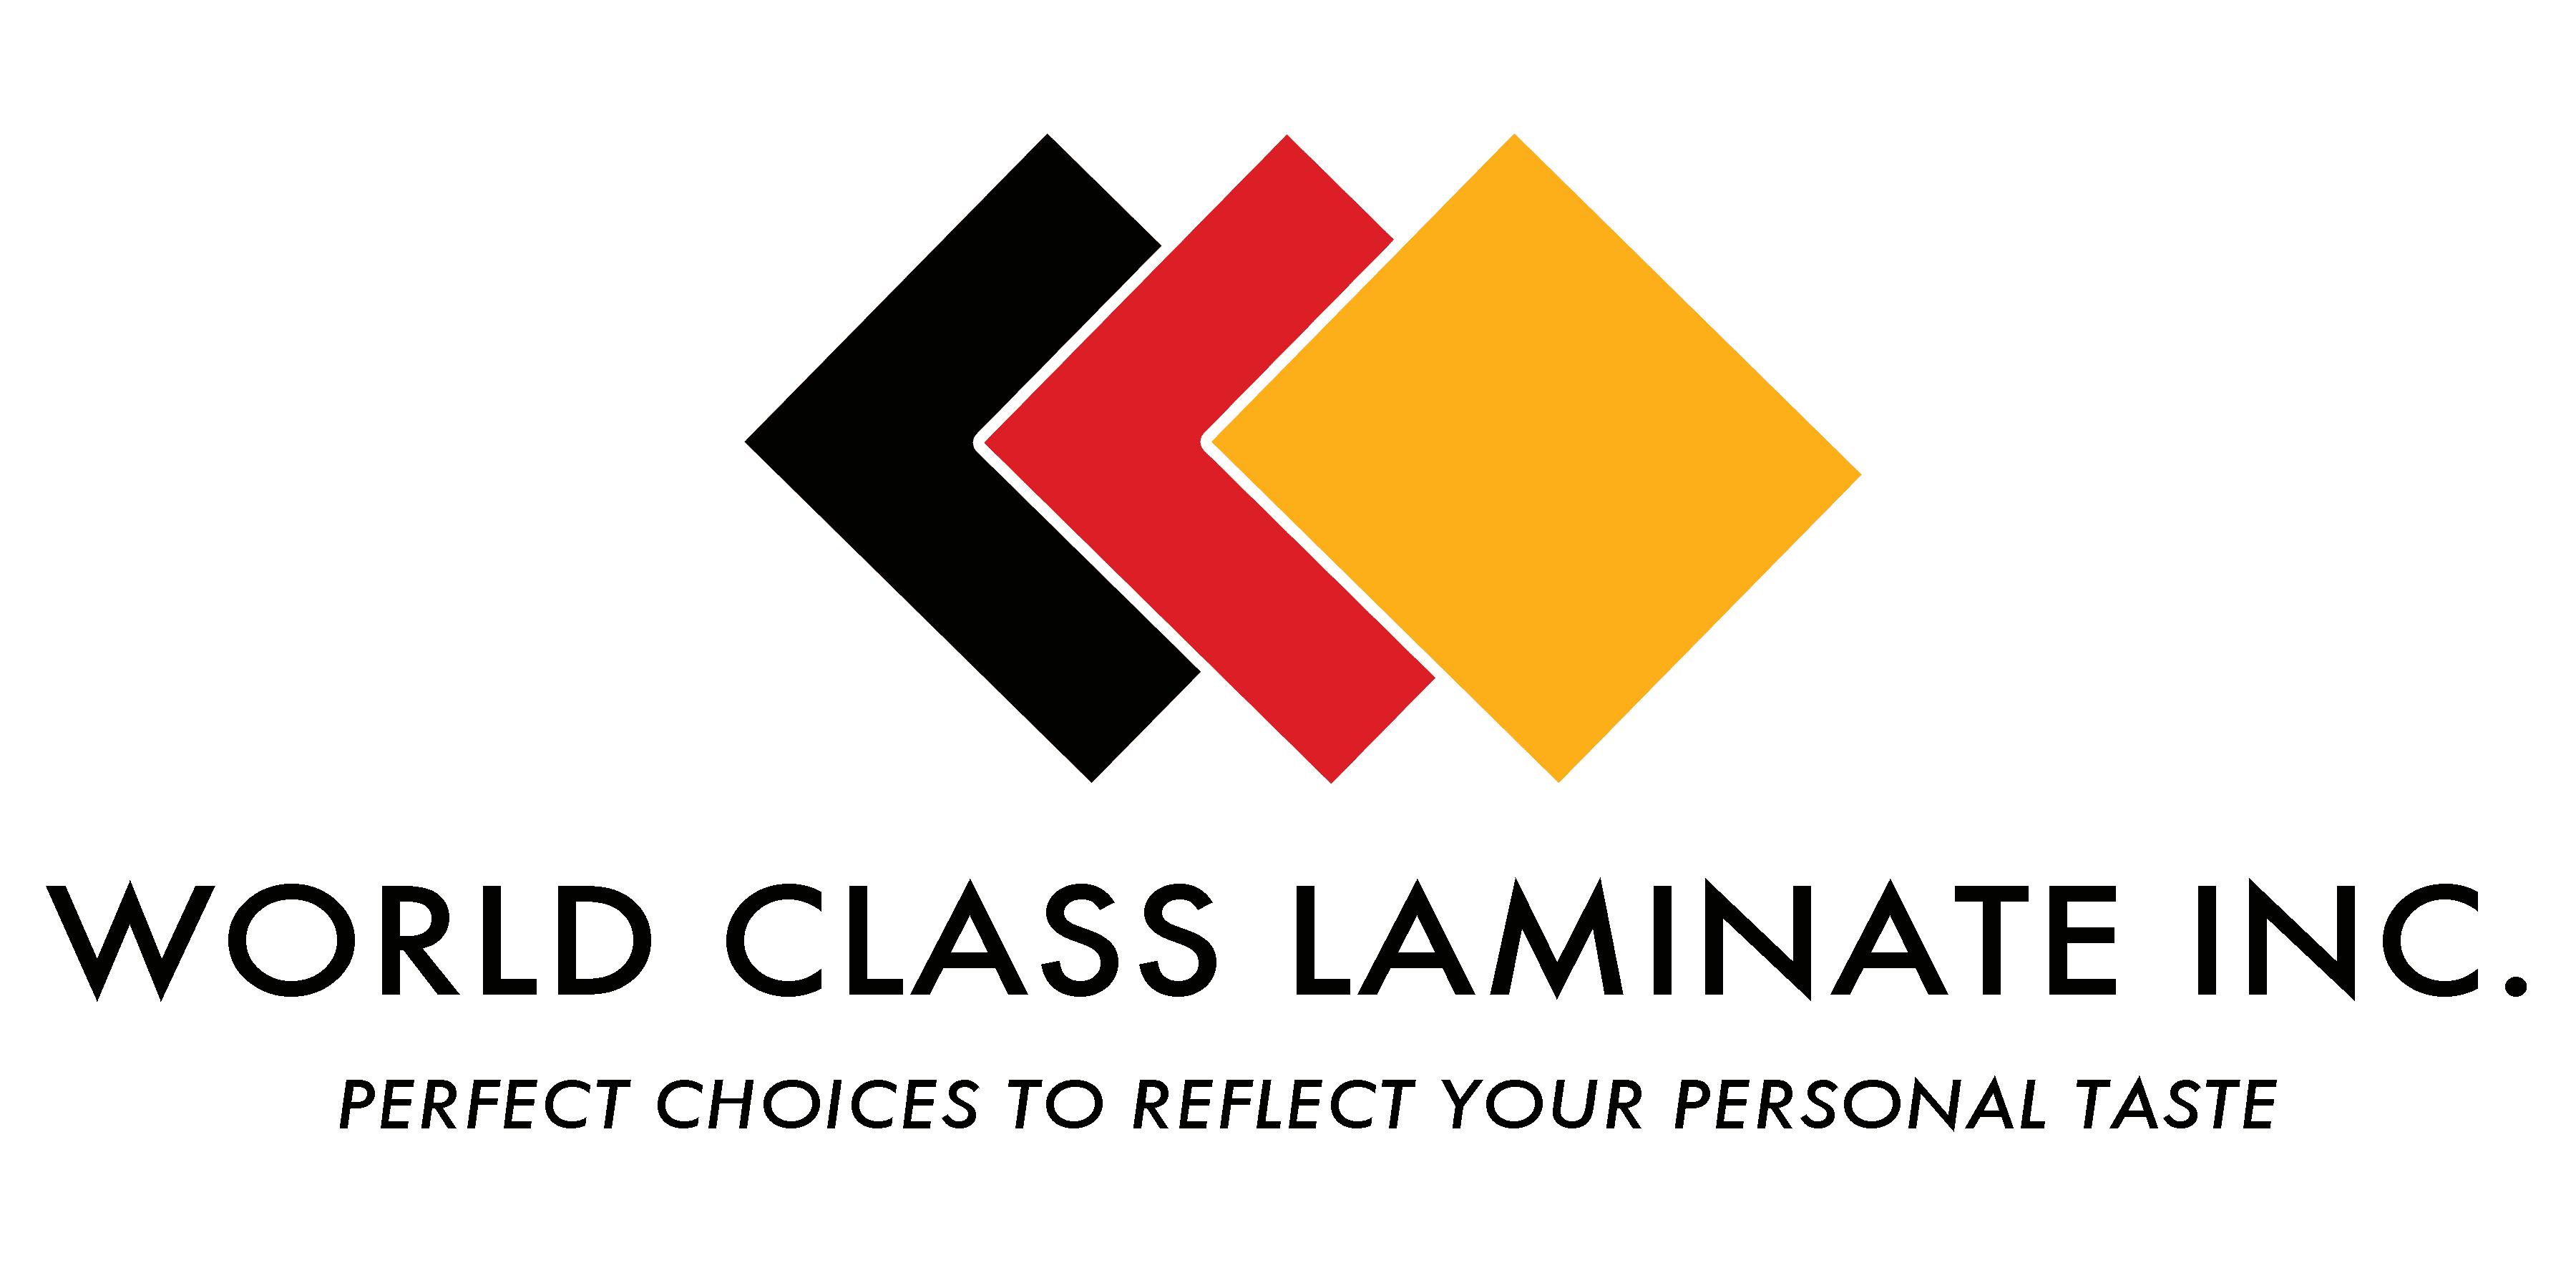 WORLD CLASS LAMINATE INC.